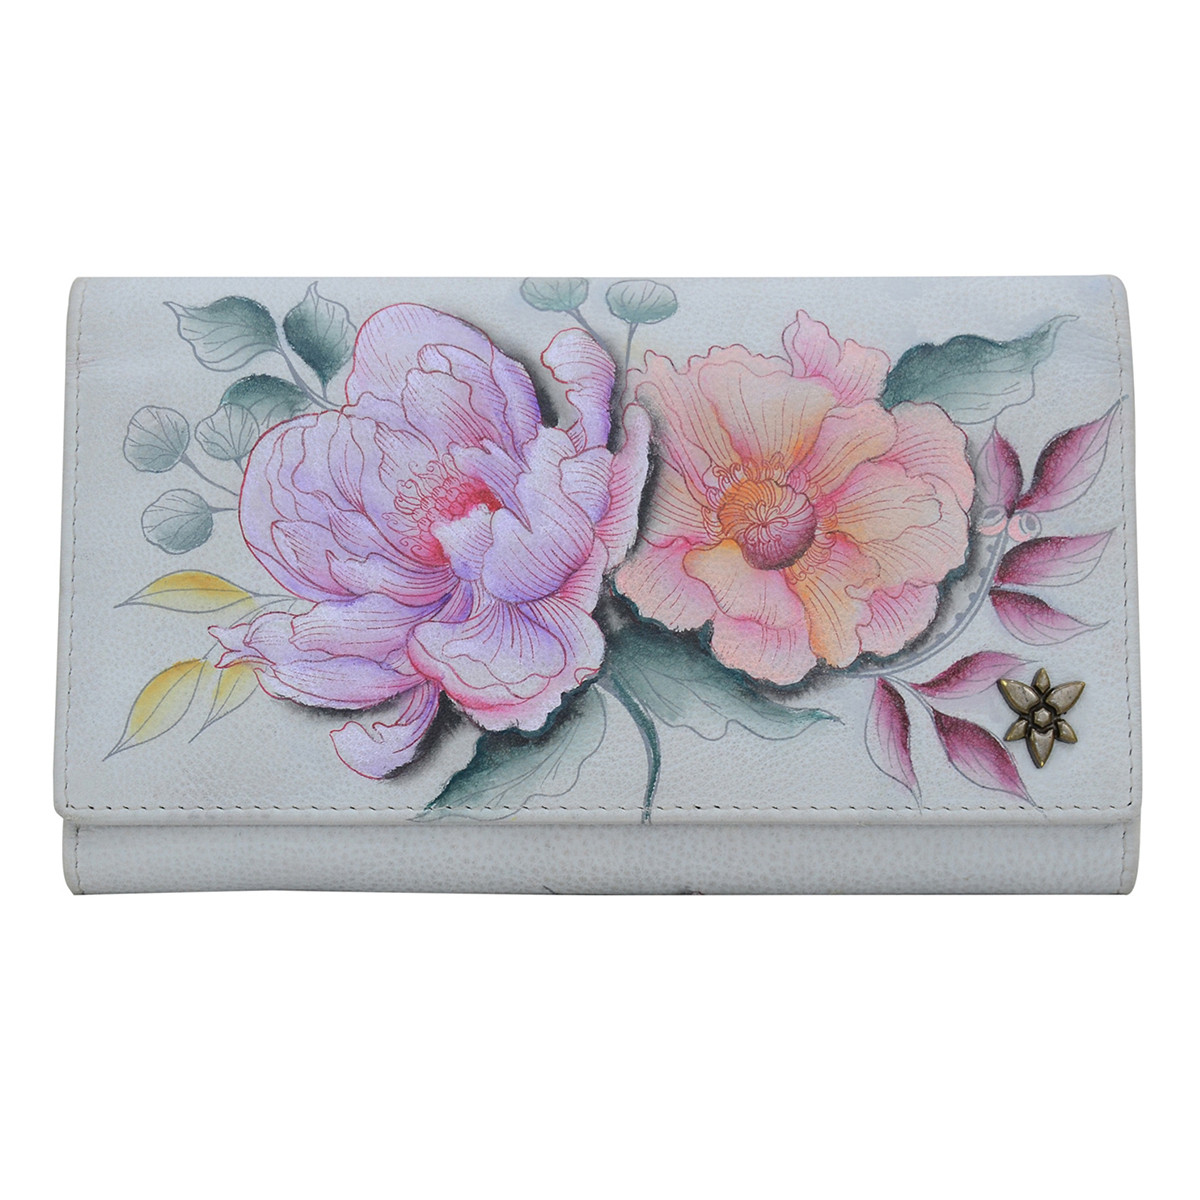 portofele dama pictate manual